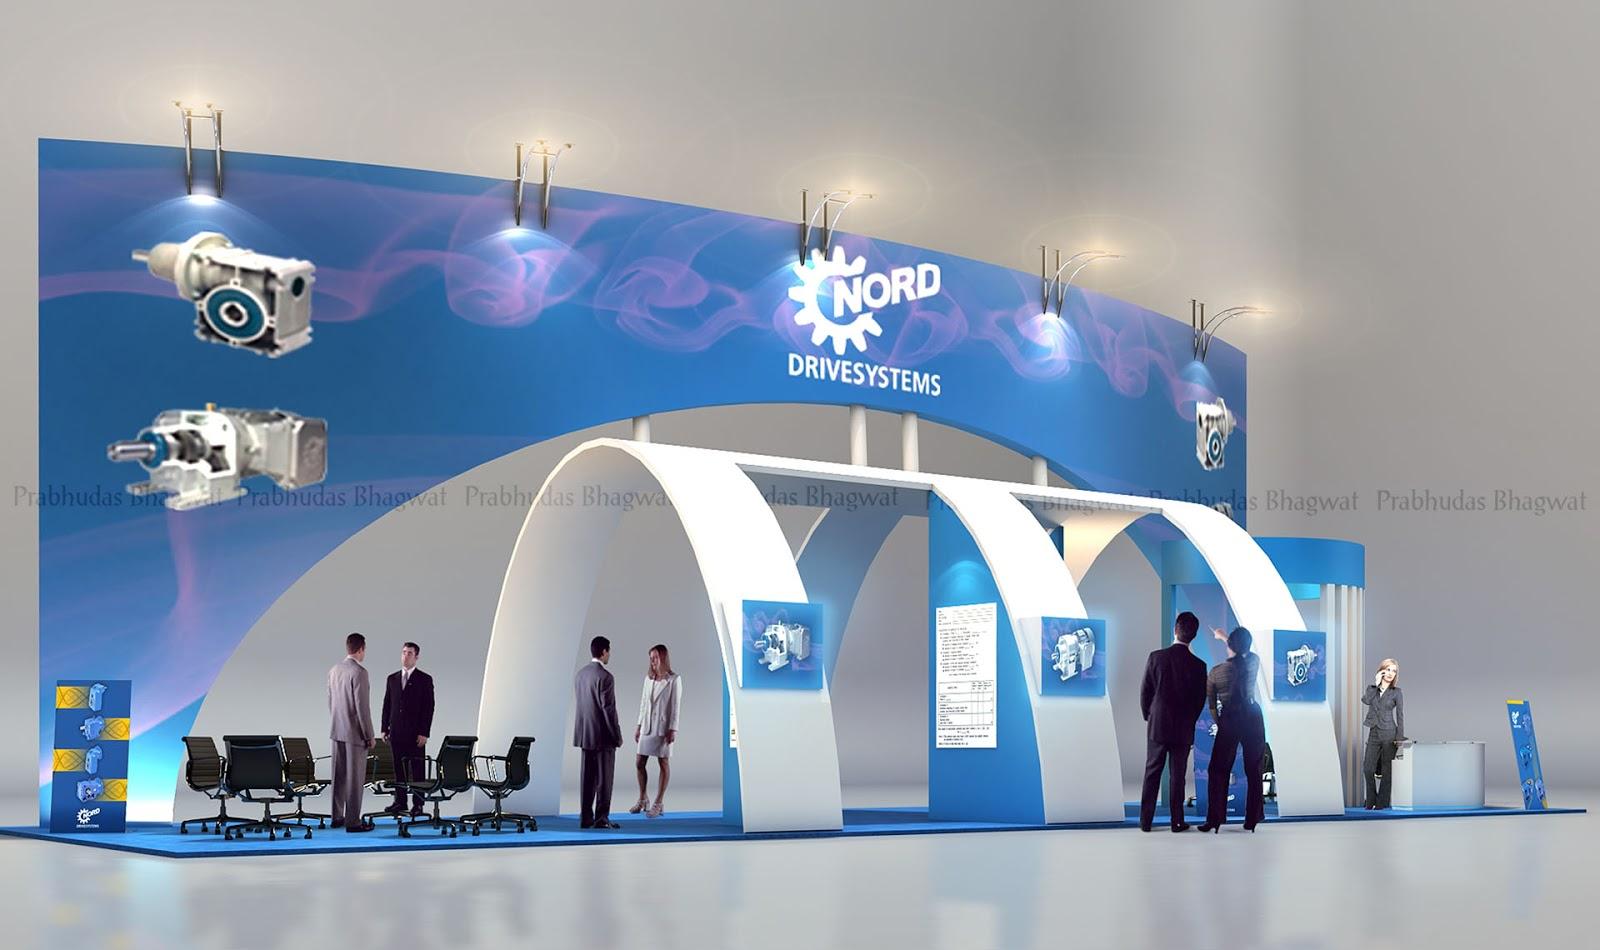 3d Exhibition Stall Design Job : Prabhudas bhagwat d artist exhibition stall designing